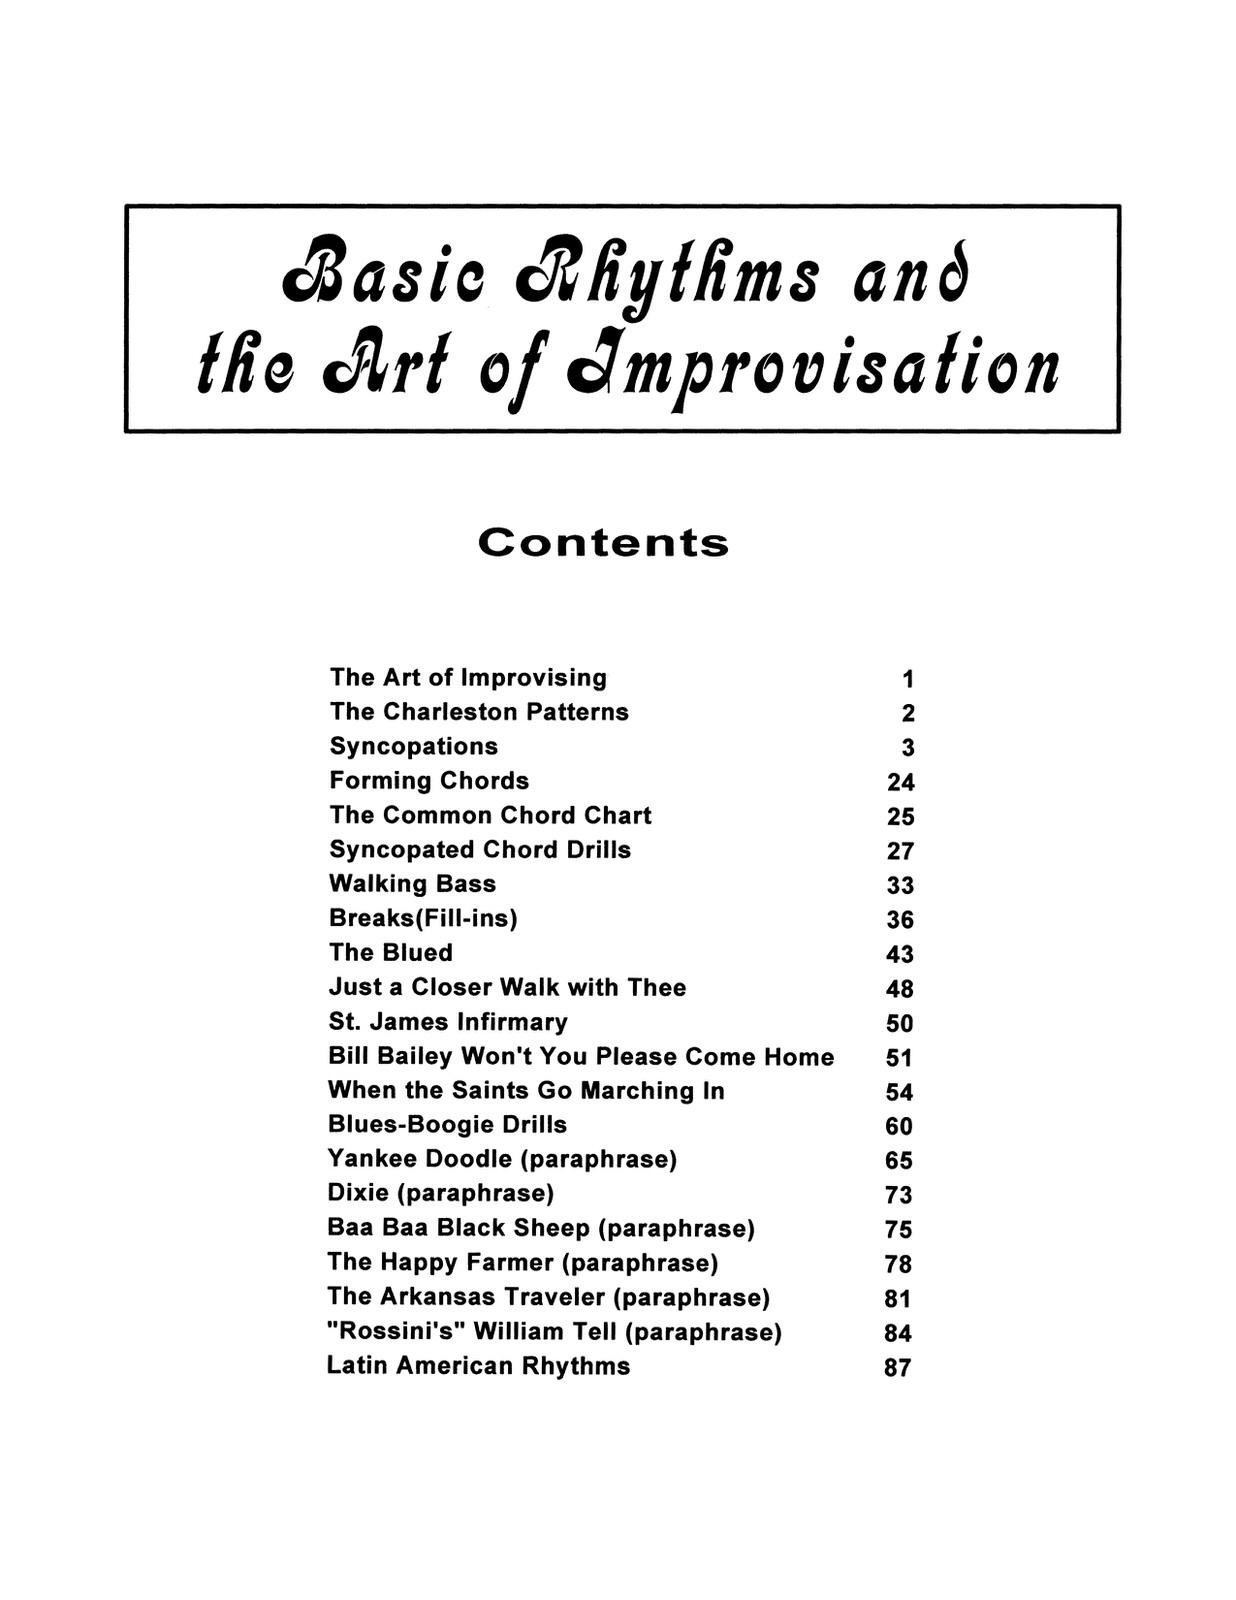 Tarto, Joe, Basic Rhythms and the Art of Improvisation-p003